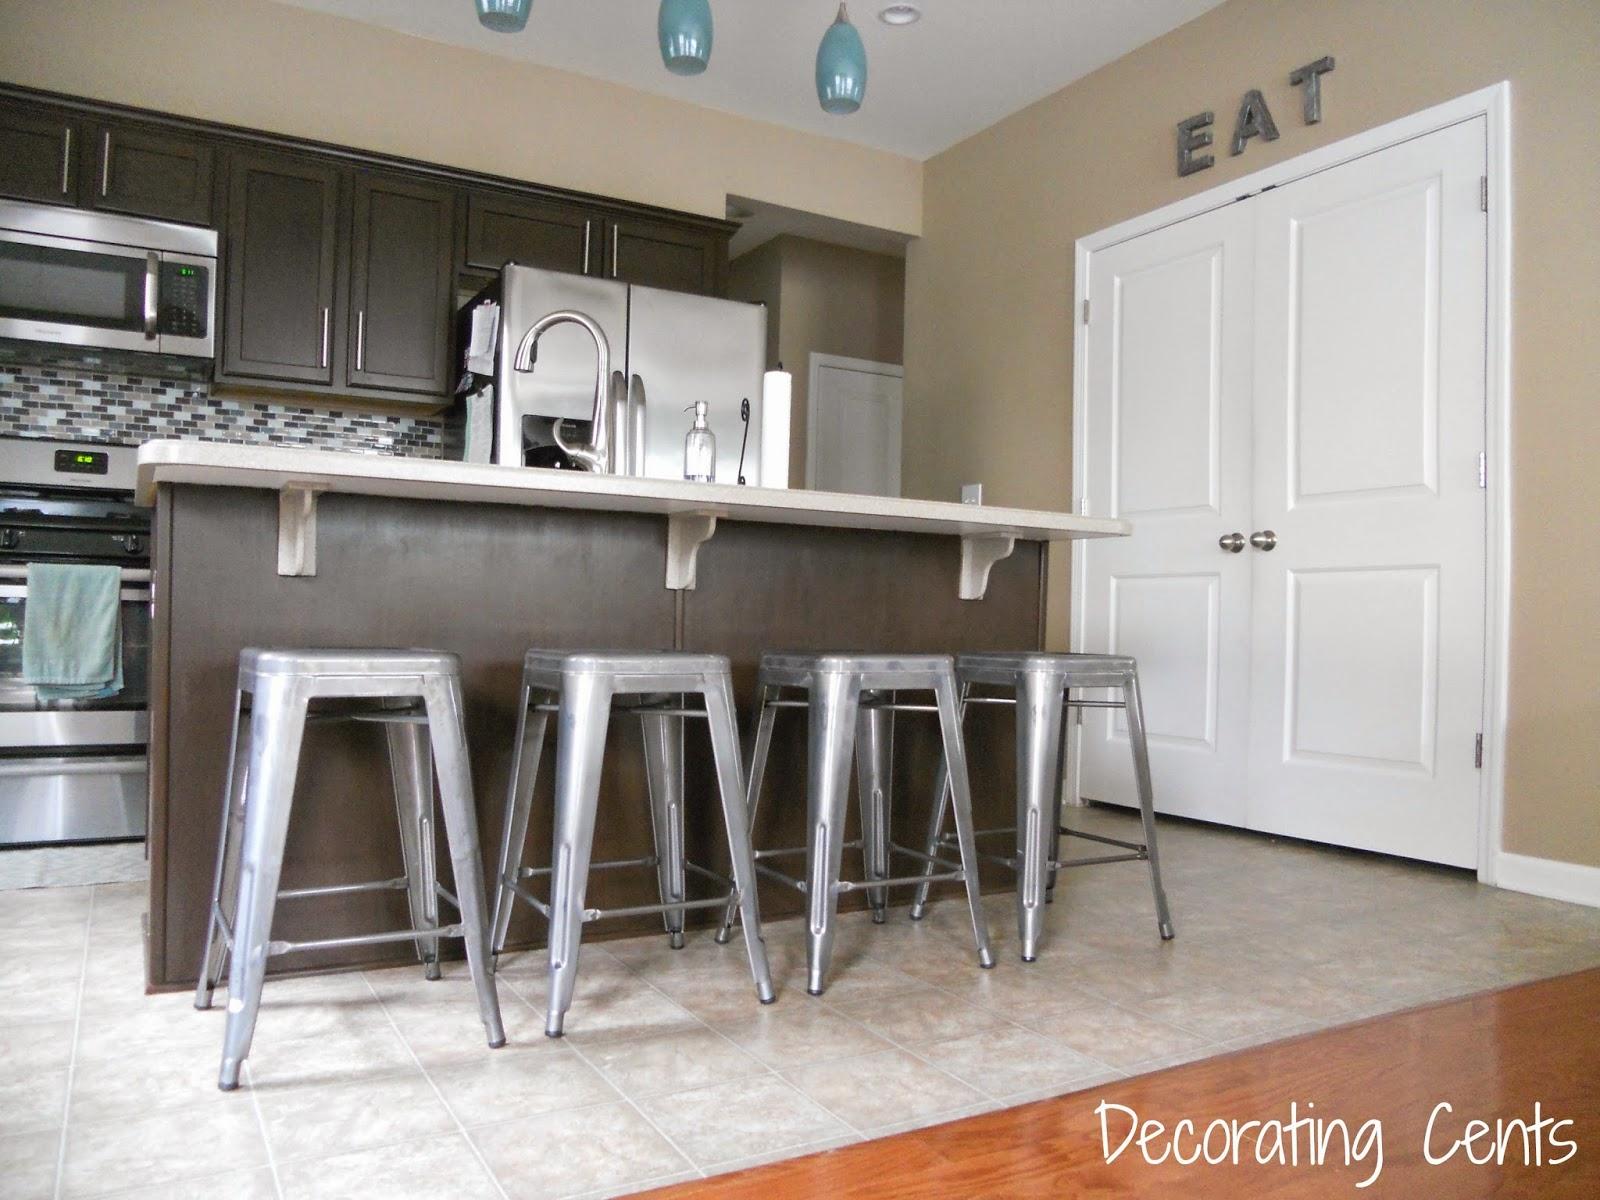 Decorating Cents: Kitchen Bar Stools